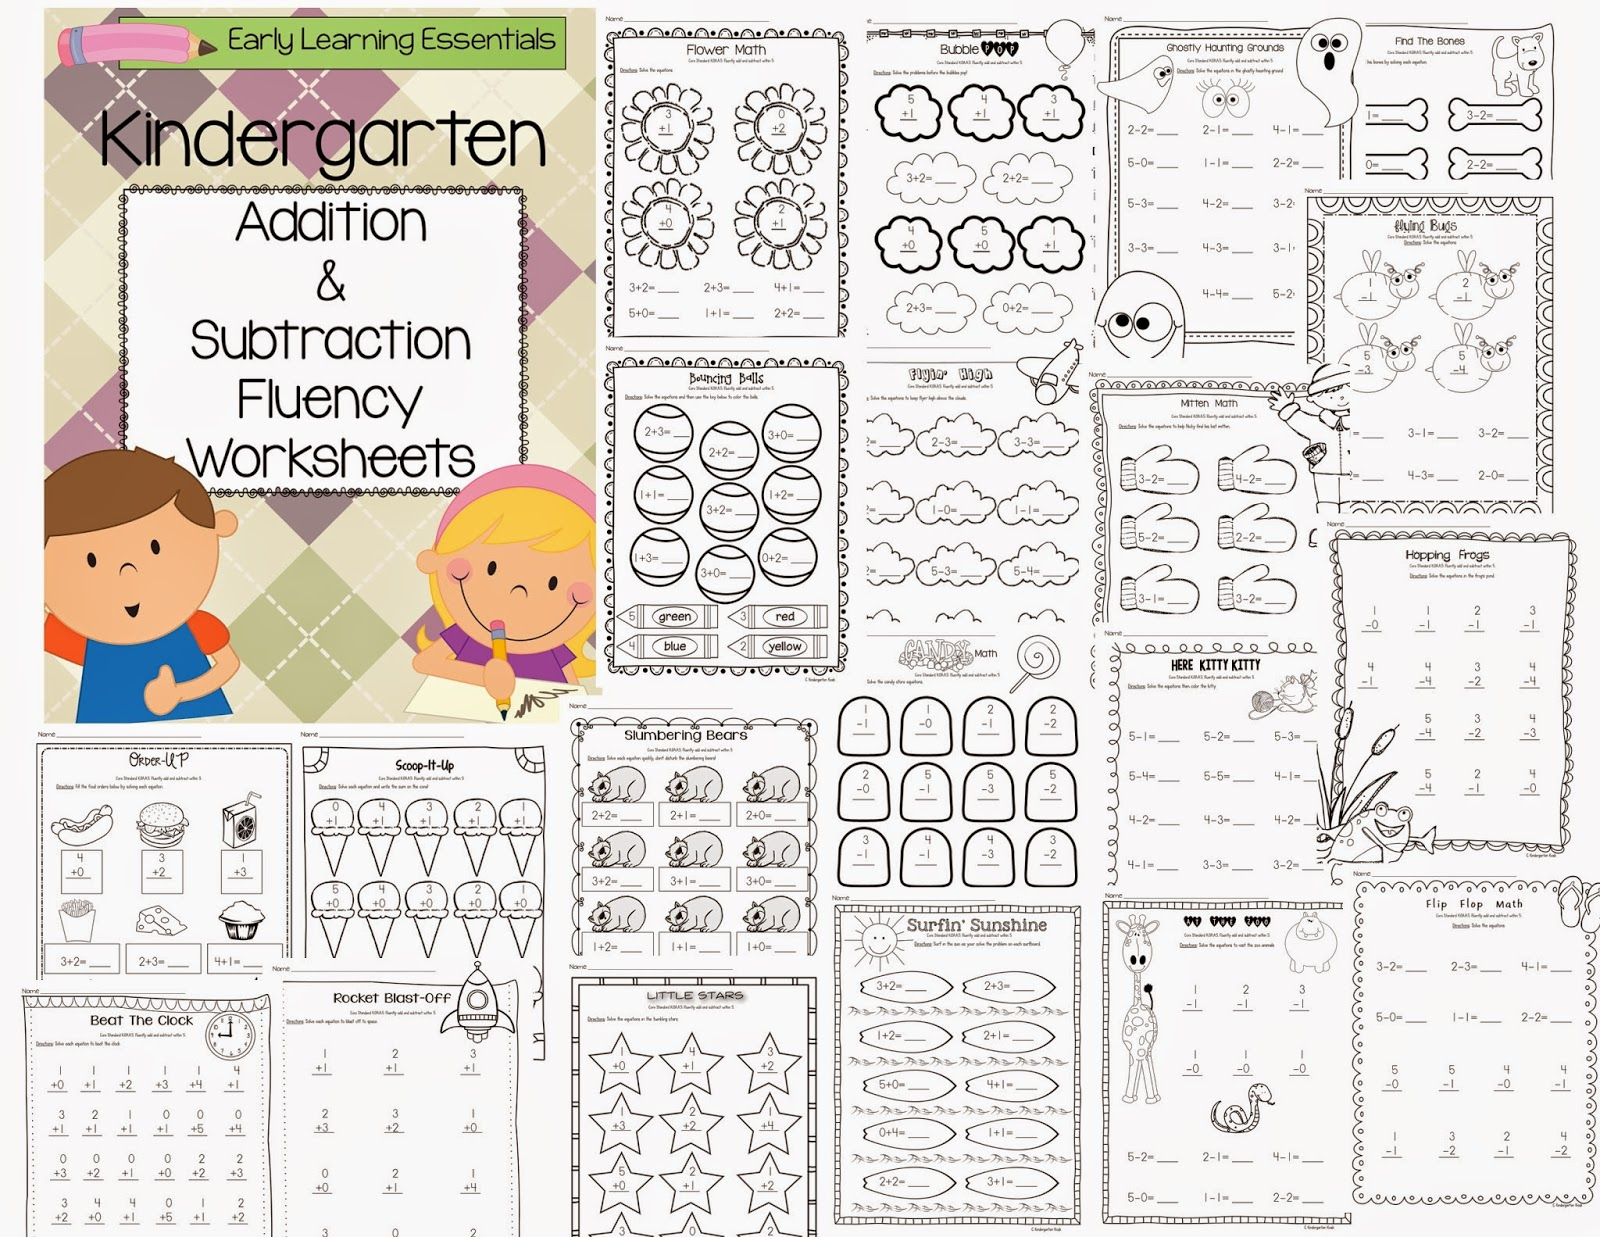 Kindergarten Kiosk Addition And Subtraction Kindergarten Worksheets